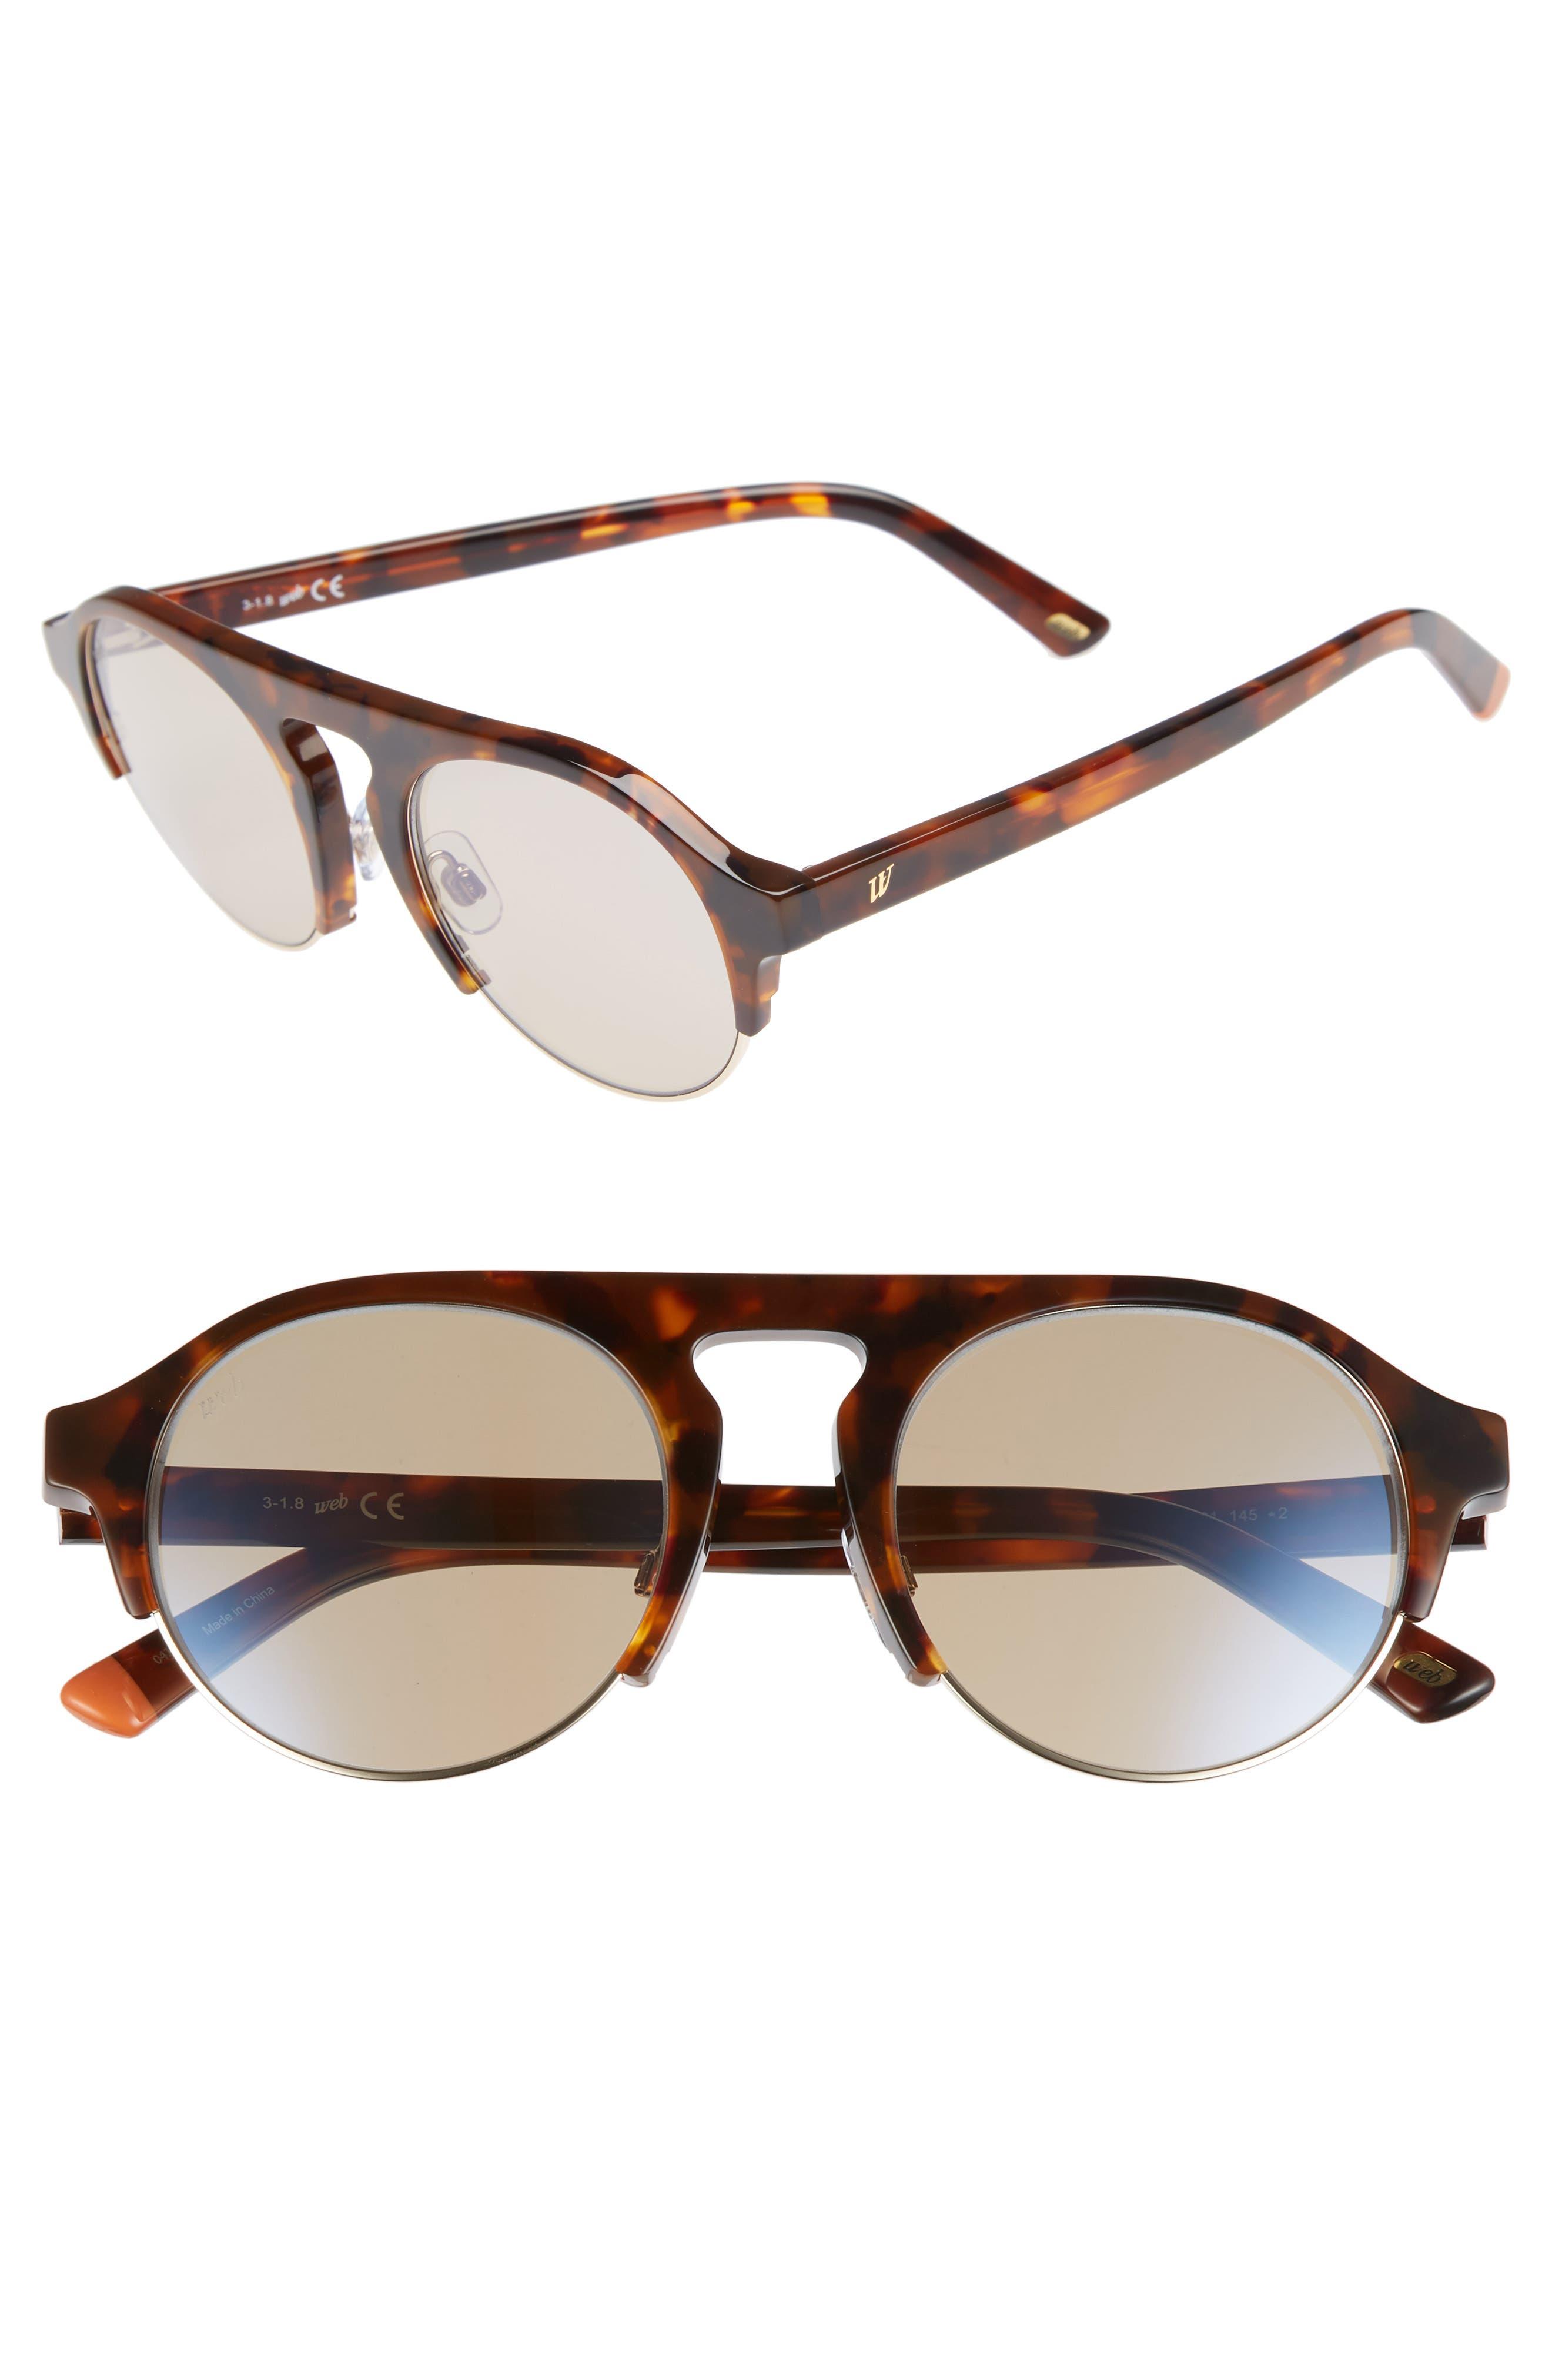 52mm Sunglasses,                         Main,                         color, Dark Havana/ Brown Mirror